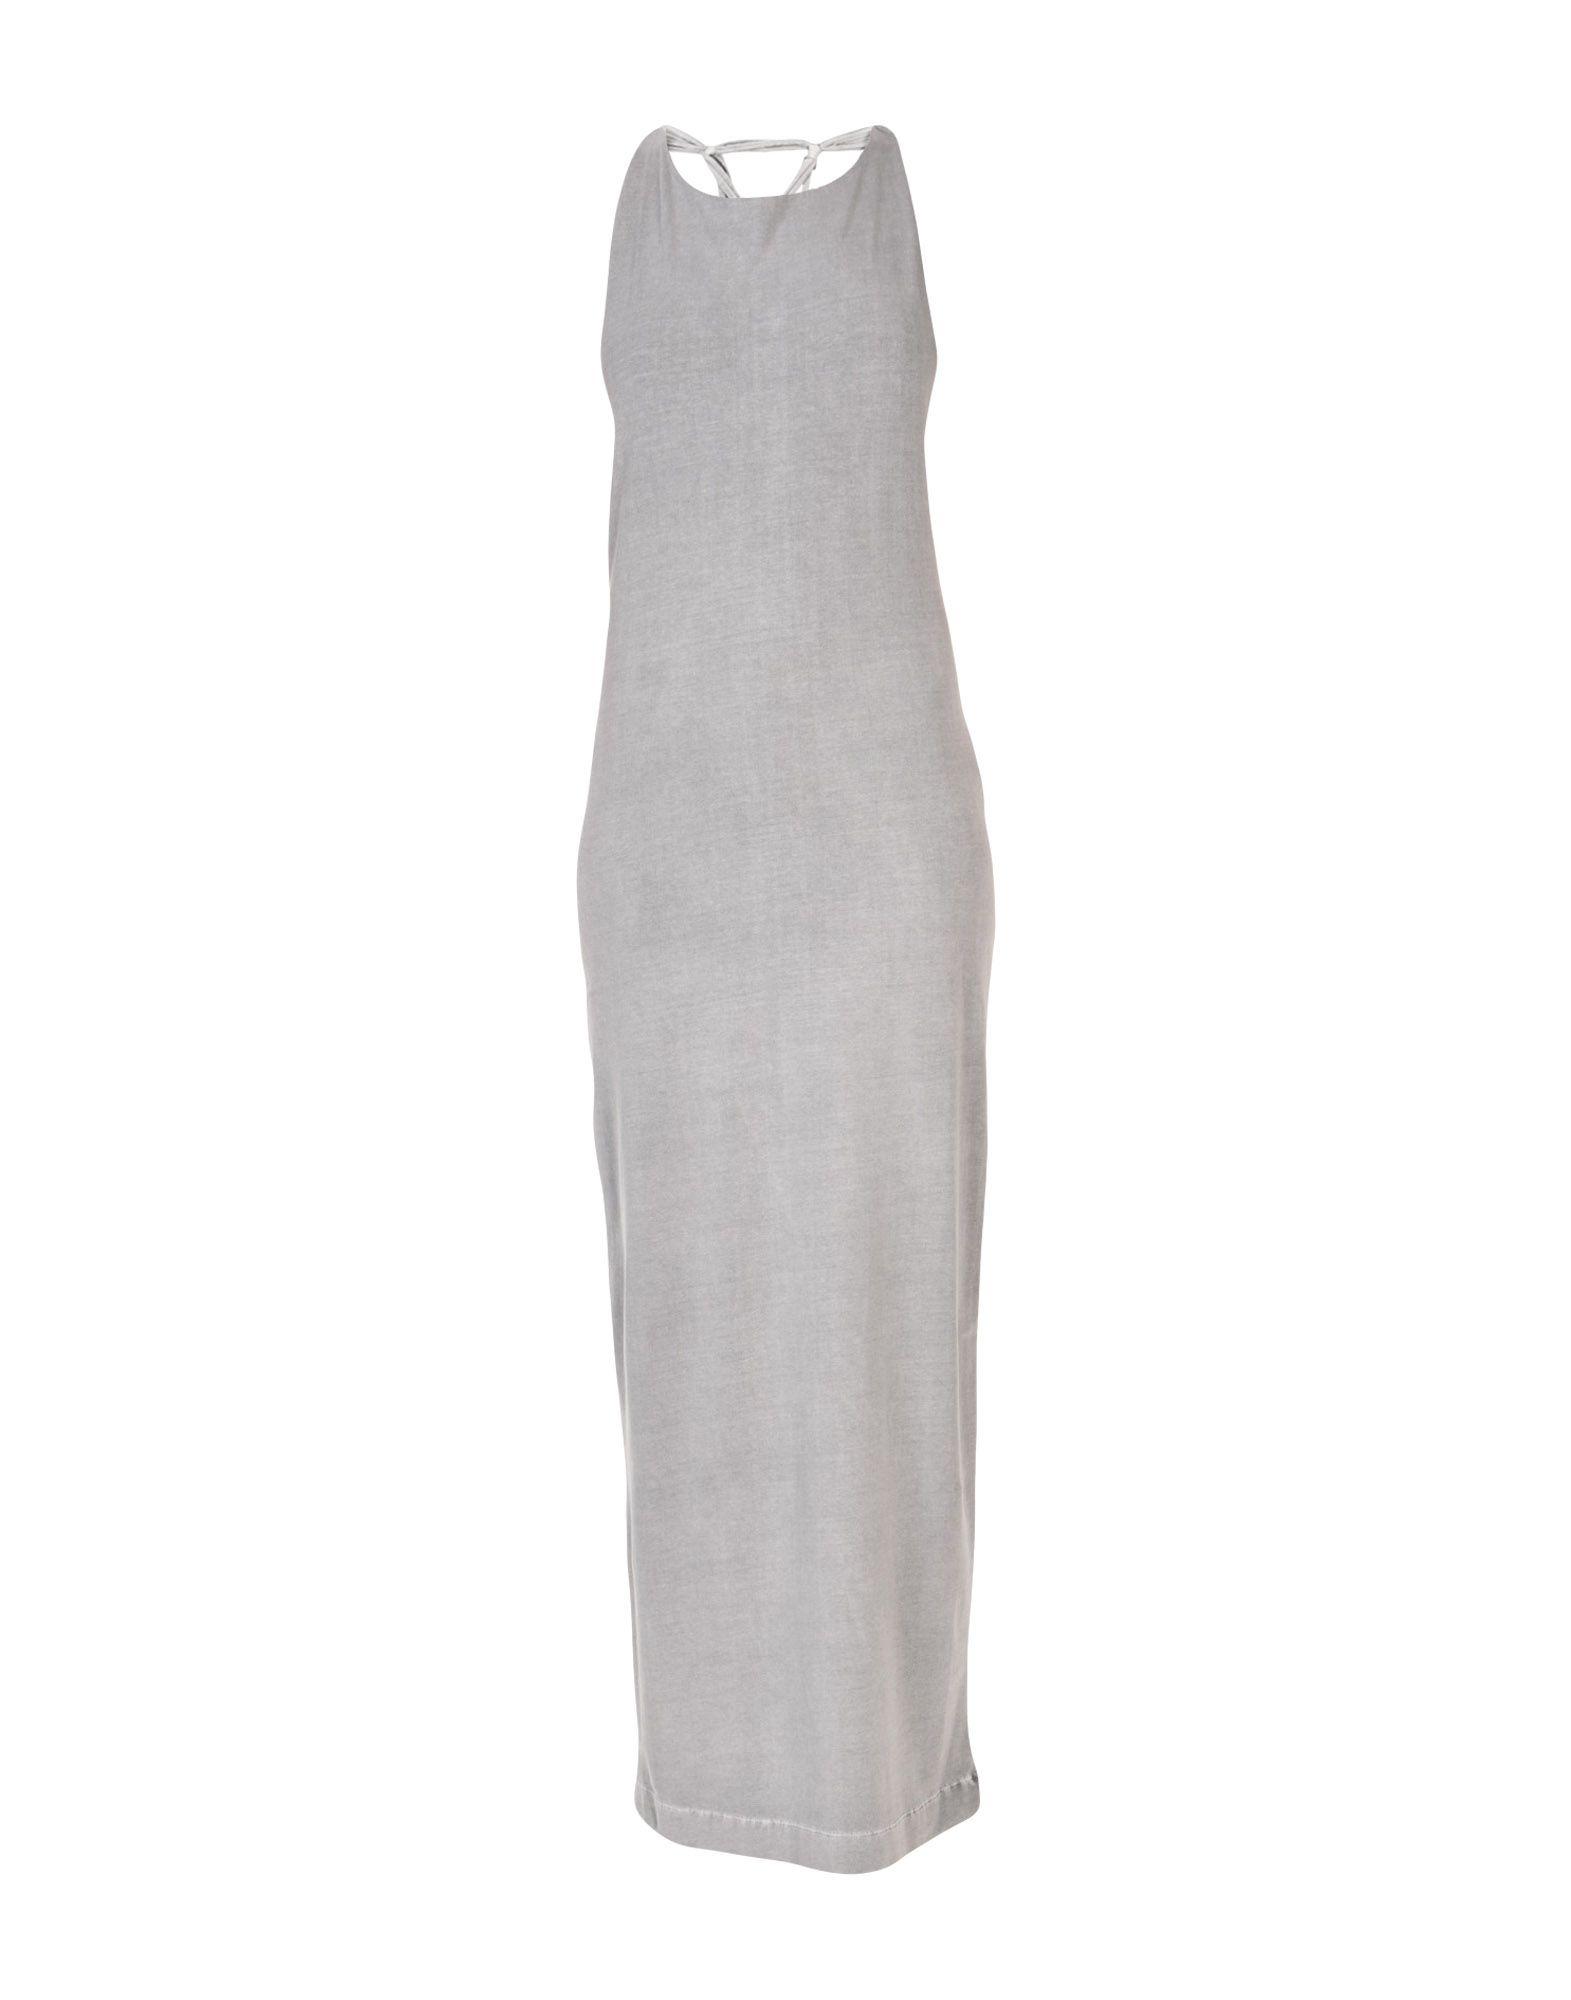 PATRIZIA PEPE Длинное платье платье patrizia pepe patrizia pepe pa748ewptm91